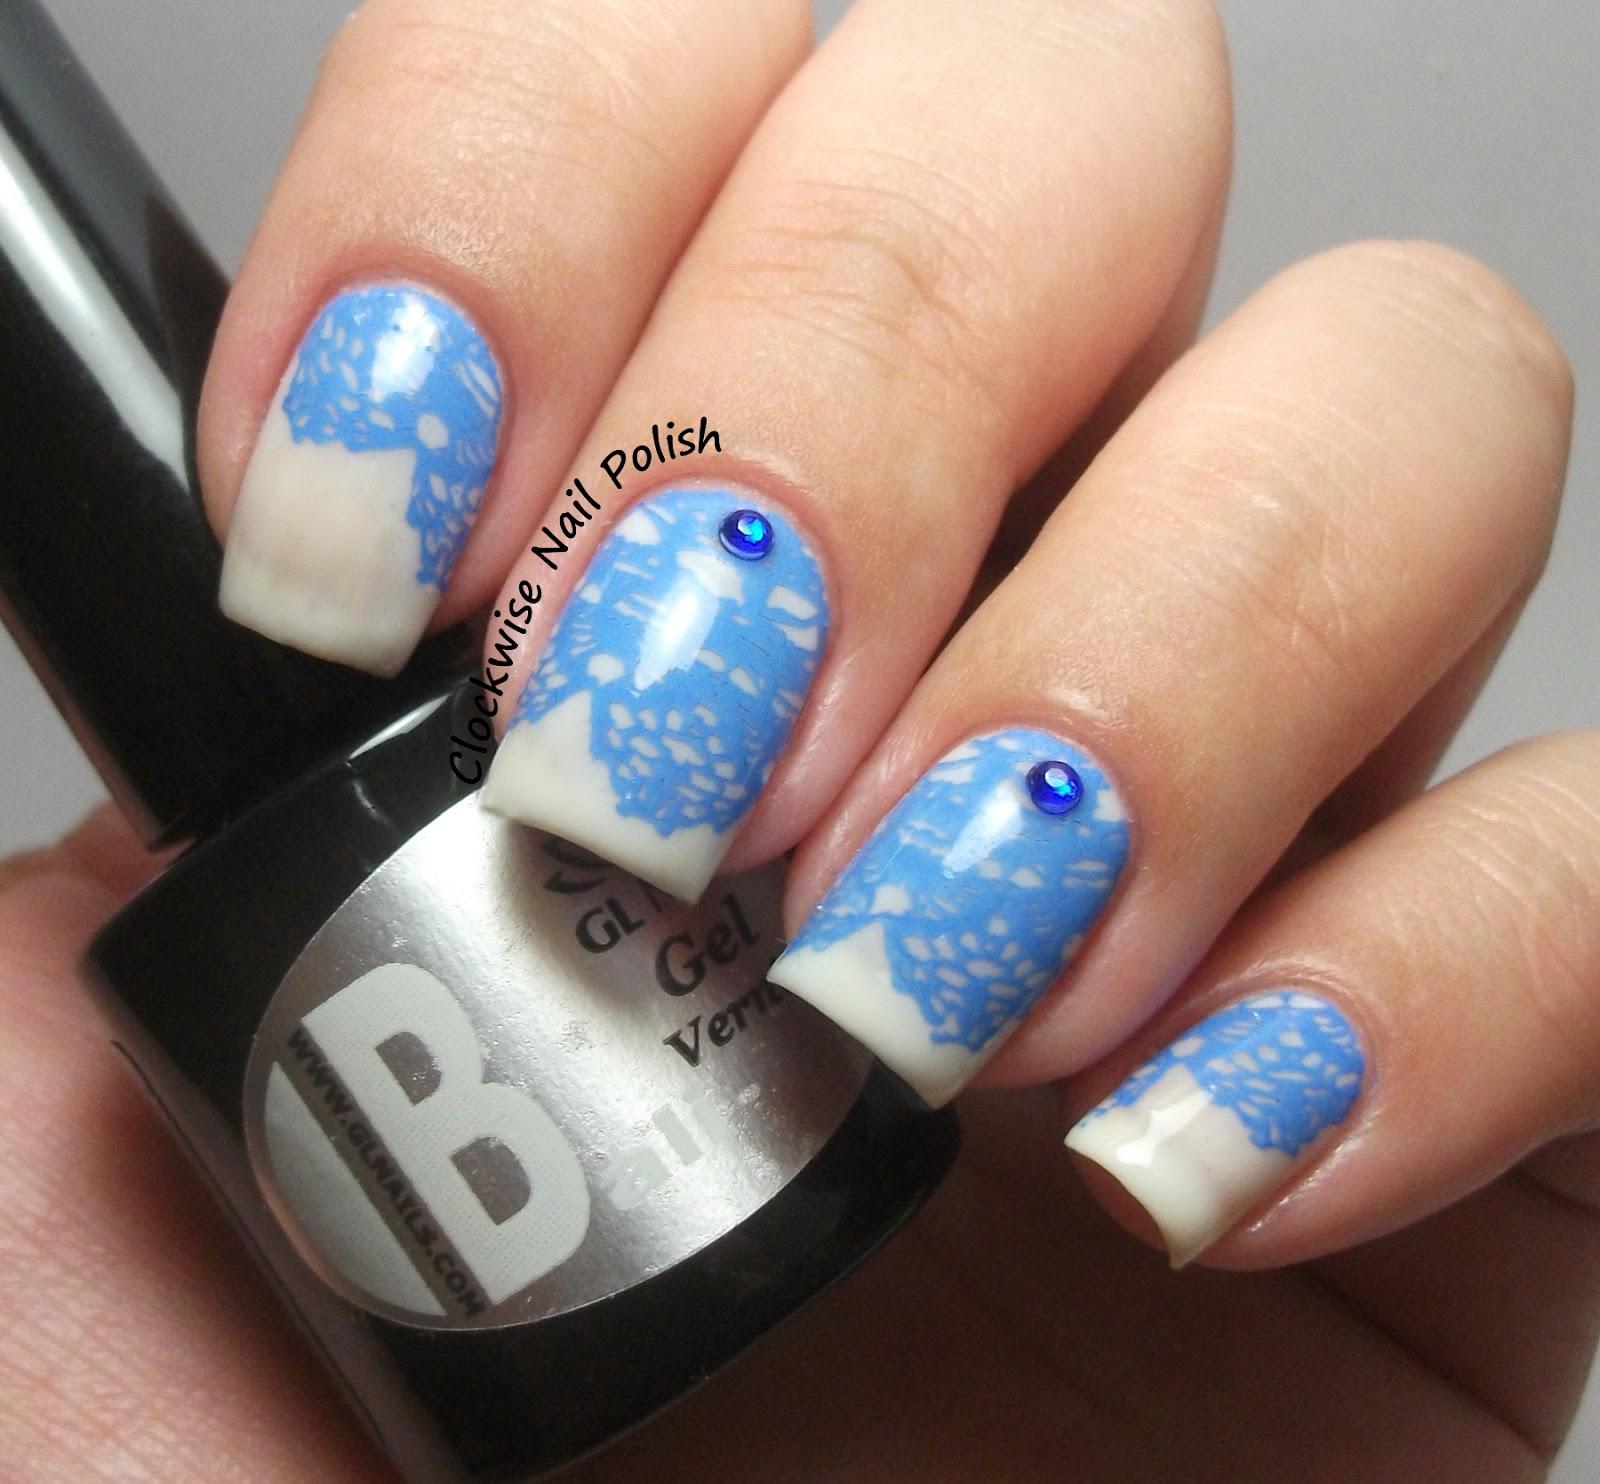 The Clockwise Nail Polish: GL Nails Um Presente Para A